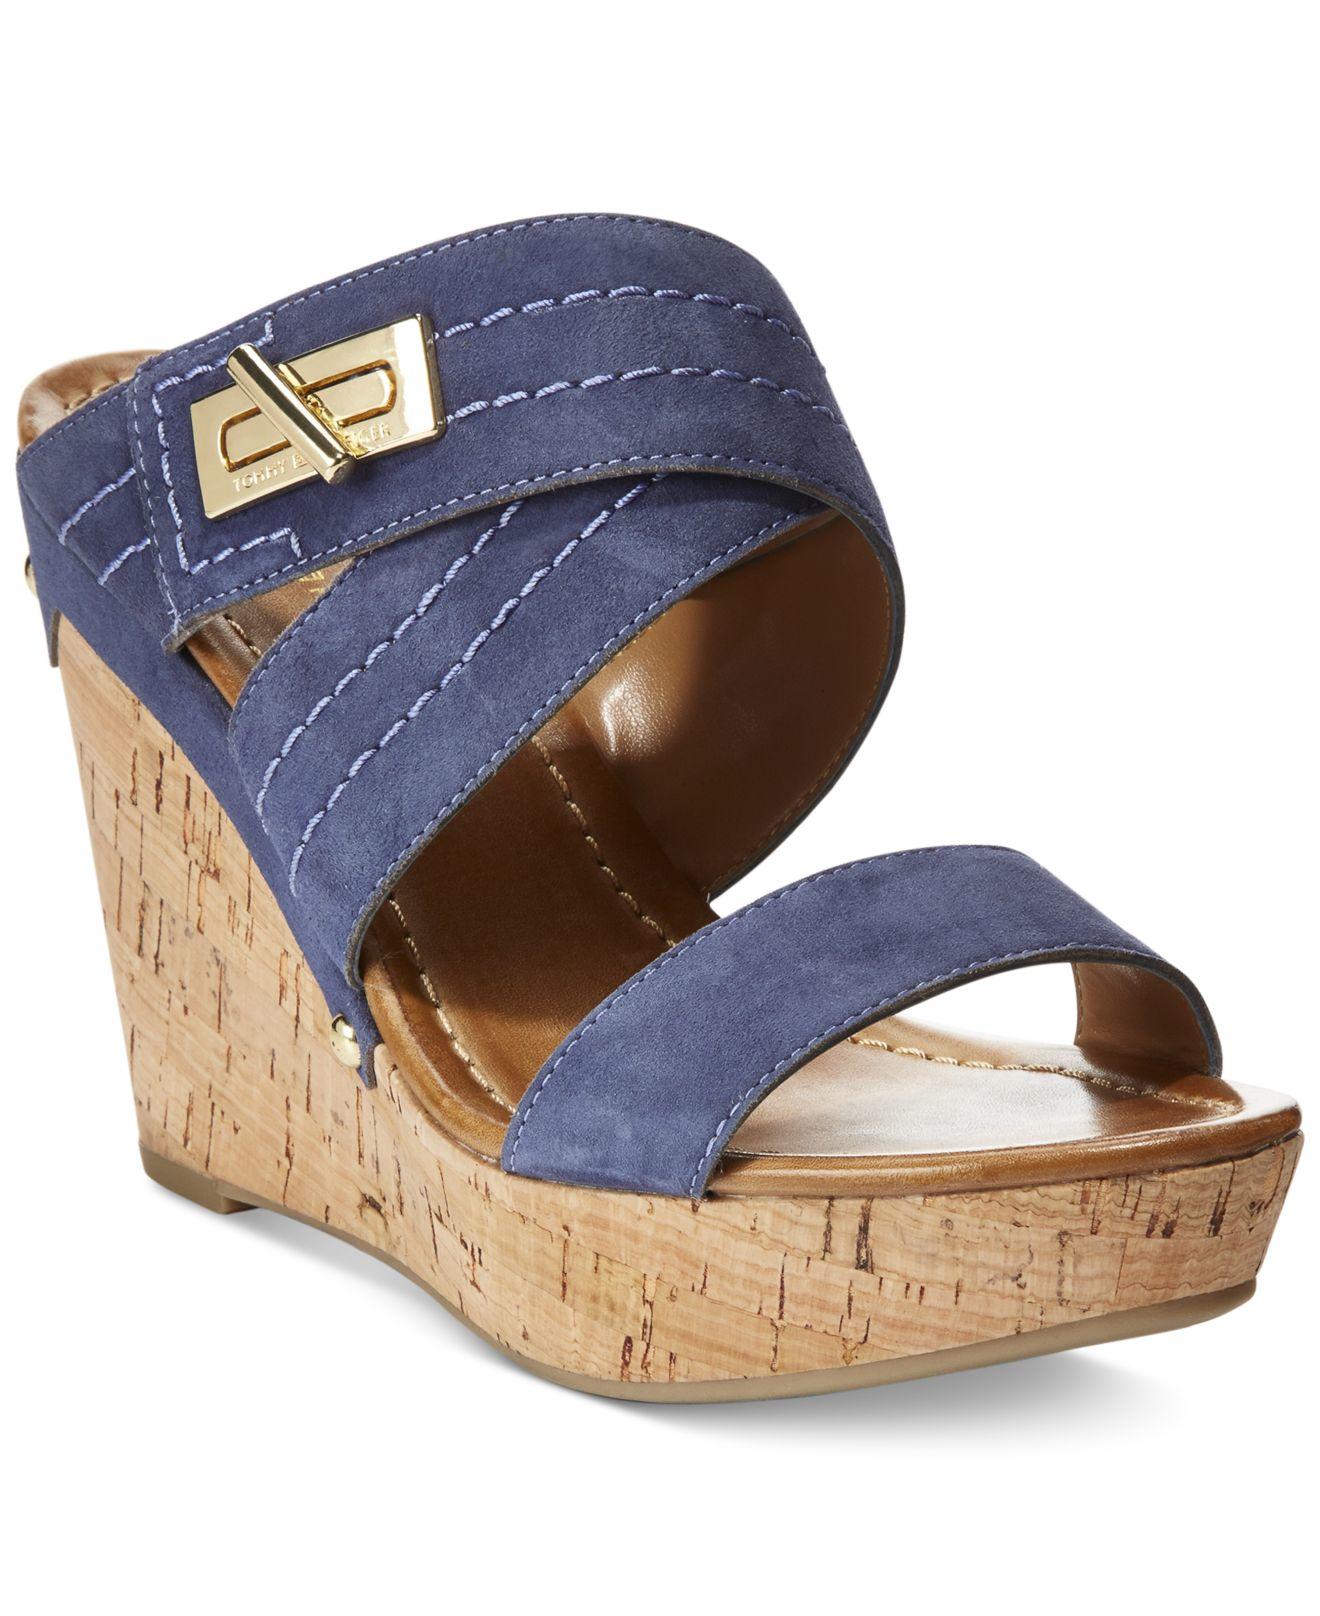 Tommy Hilfiger Mili Wedge Sandals In Blue Lyst